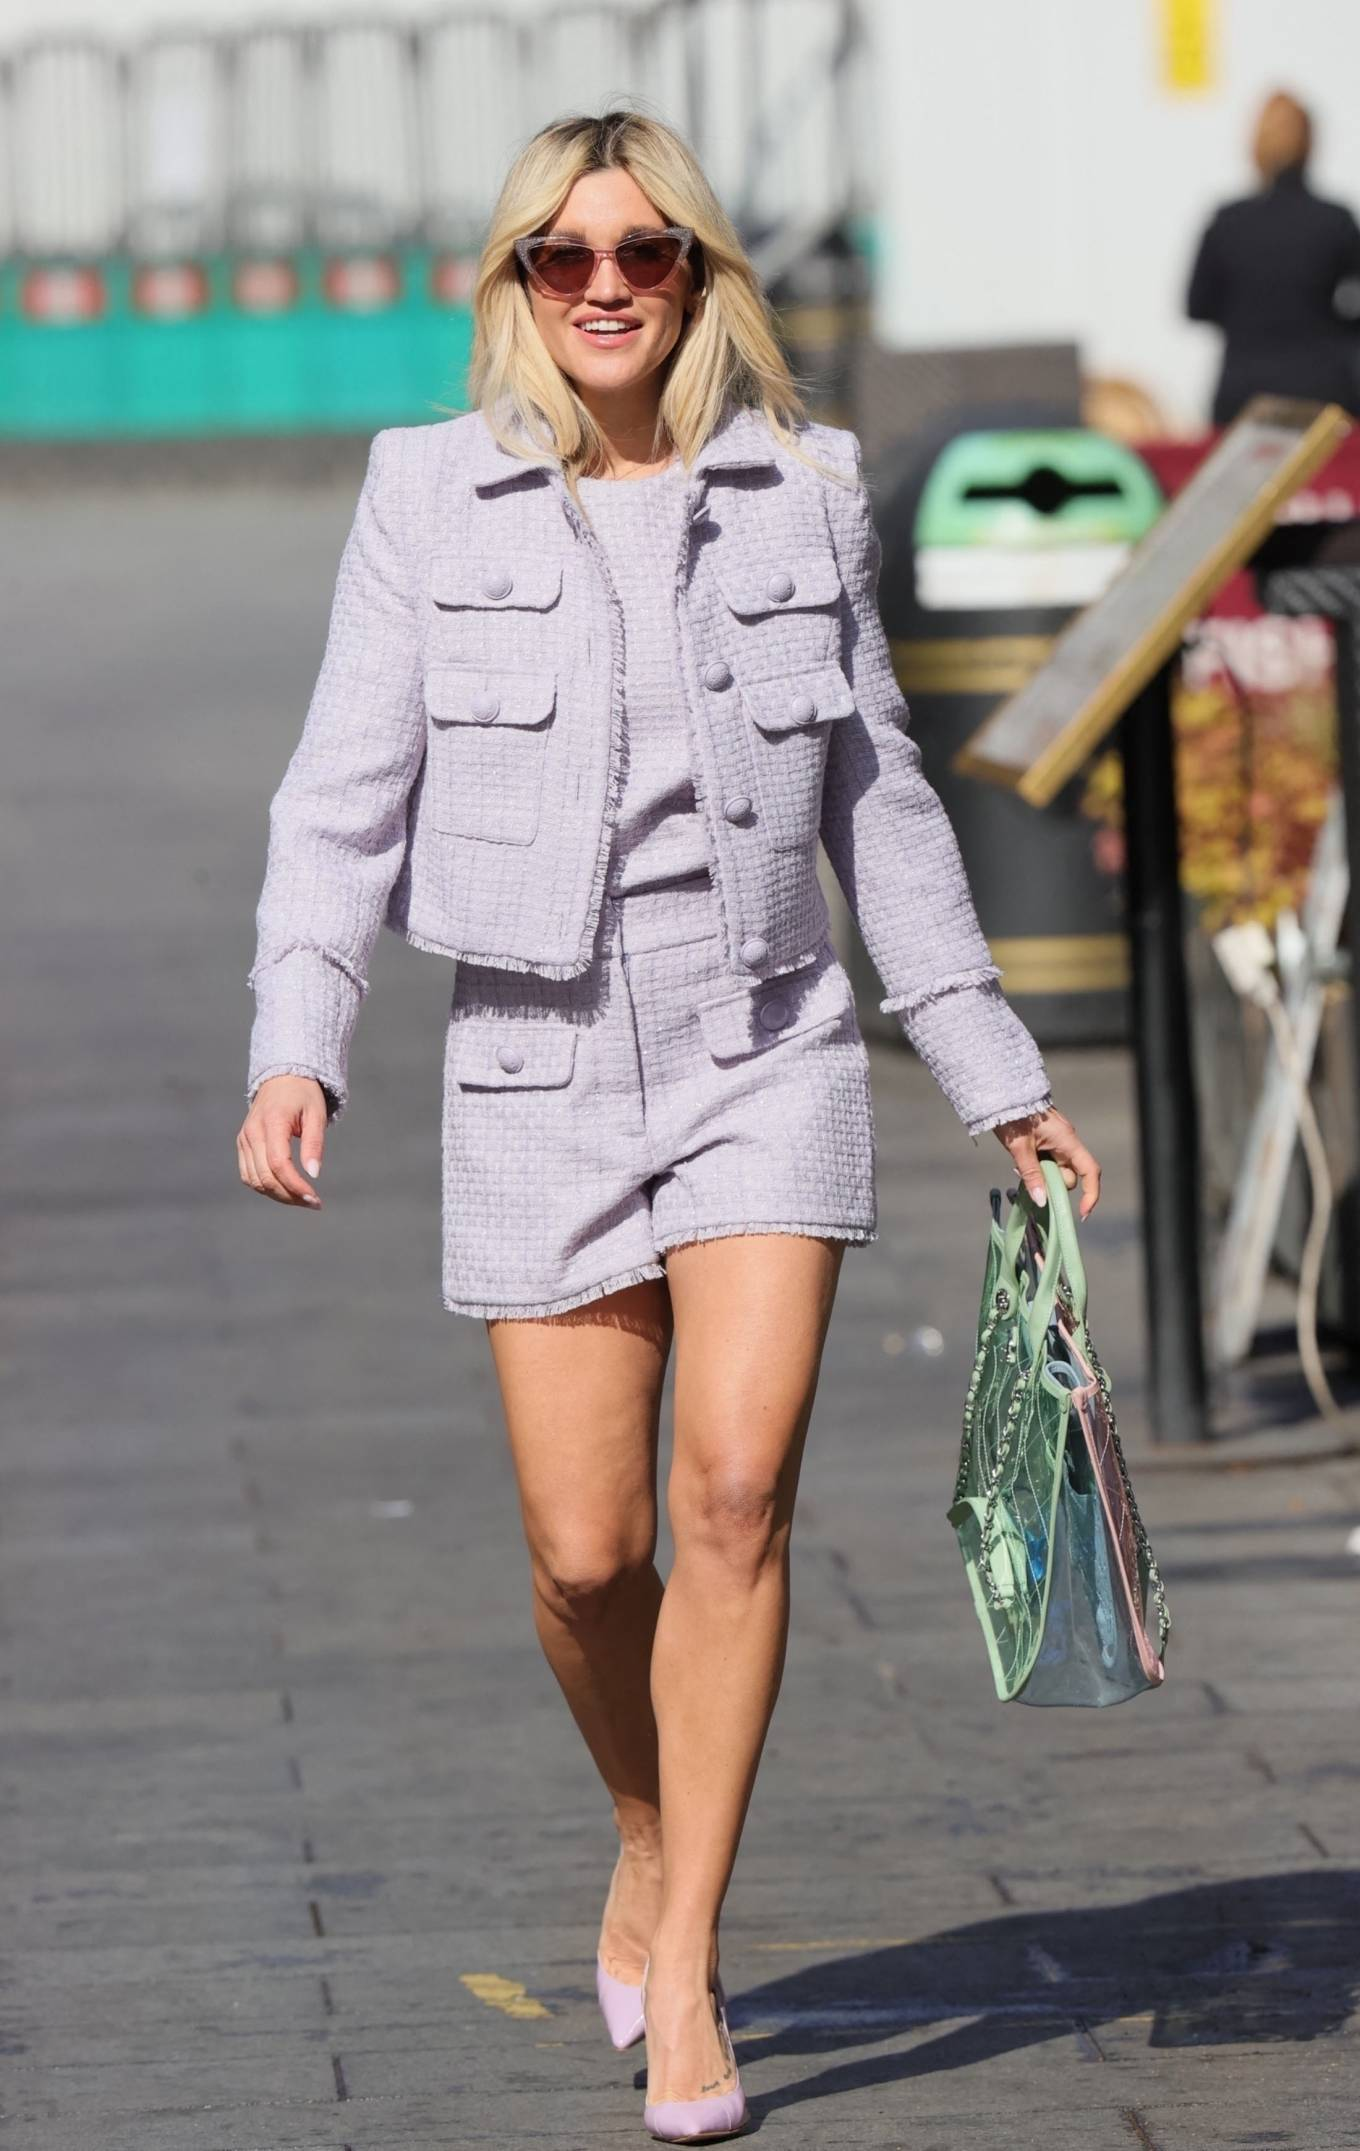 Ashley Roberts - In lilac shorts at Heart Radio Studios in London